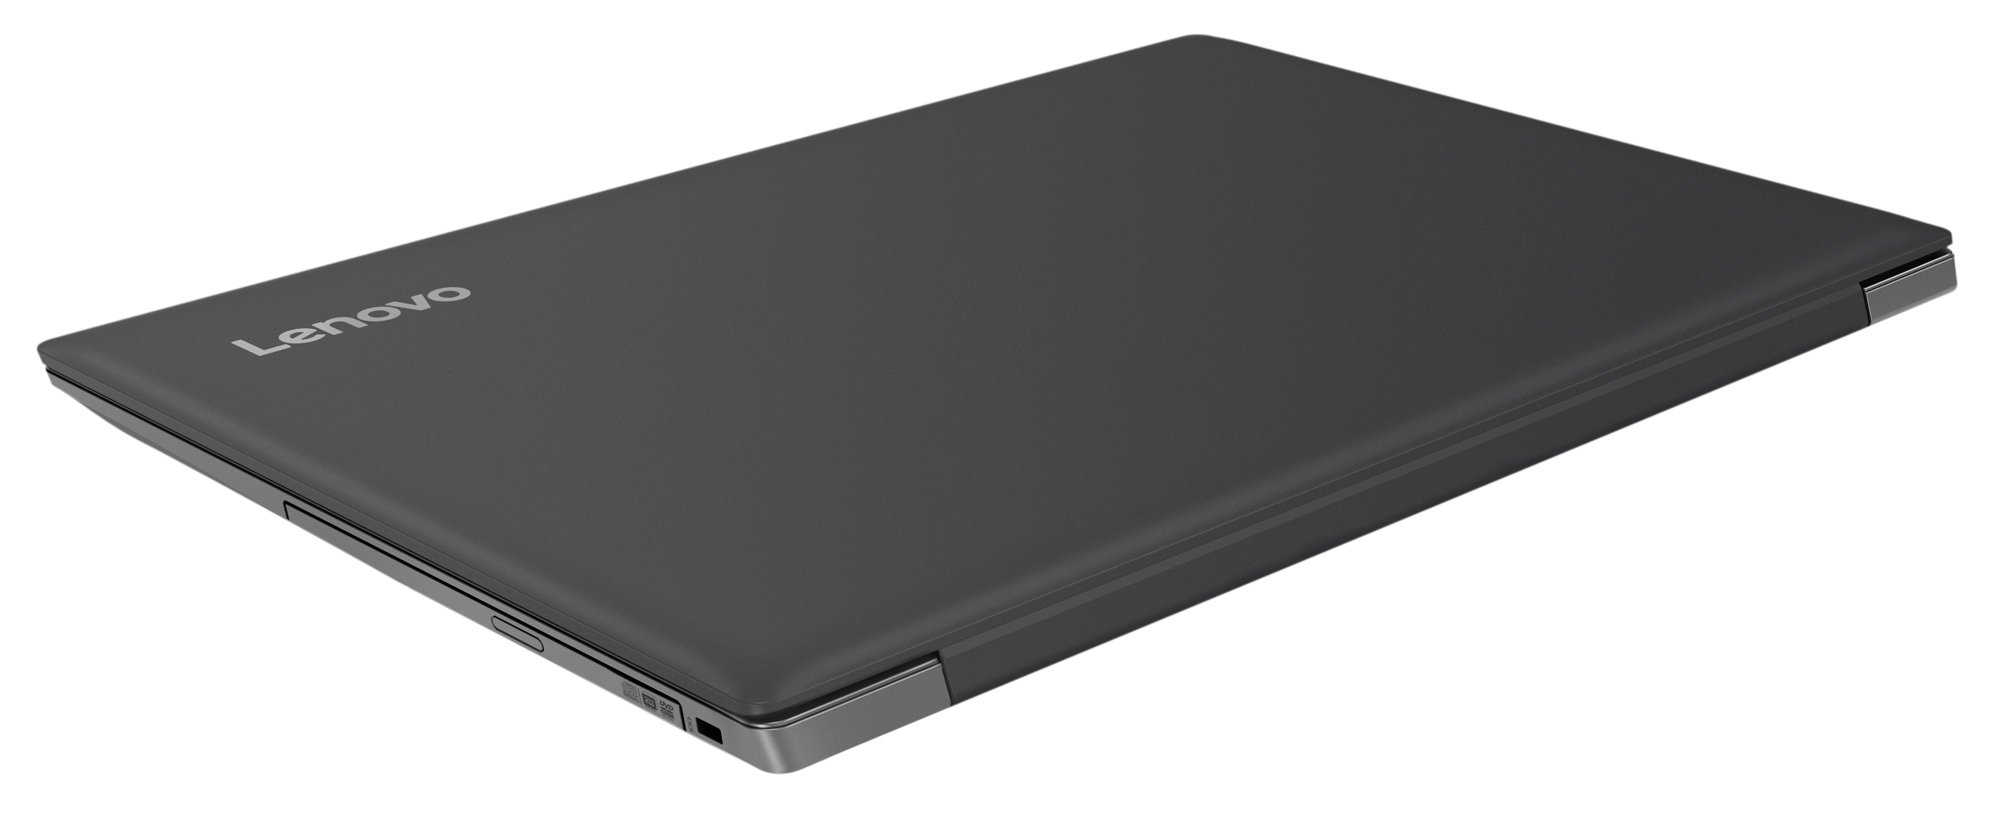 Фото  Ноутбук Lenovo ideapad 330-15 Onyx Black (81DE01VNRA)